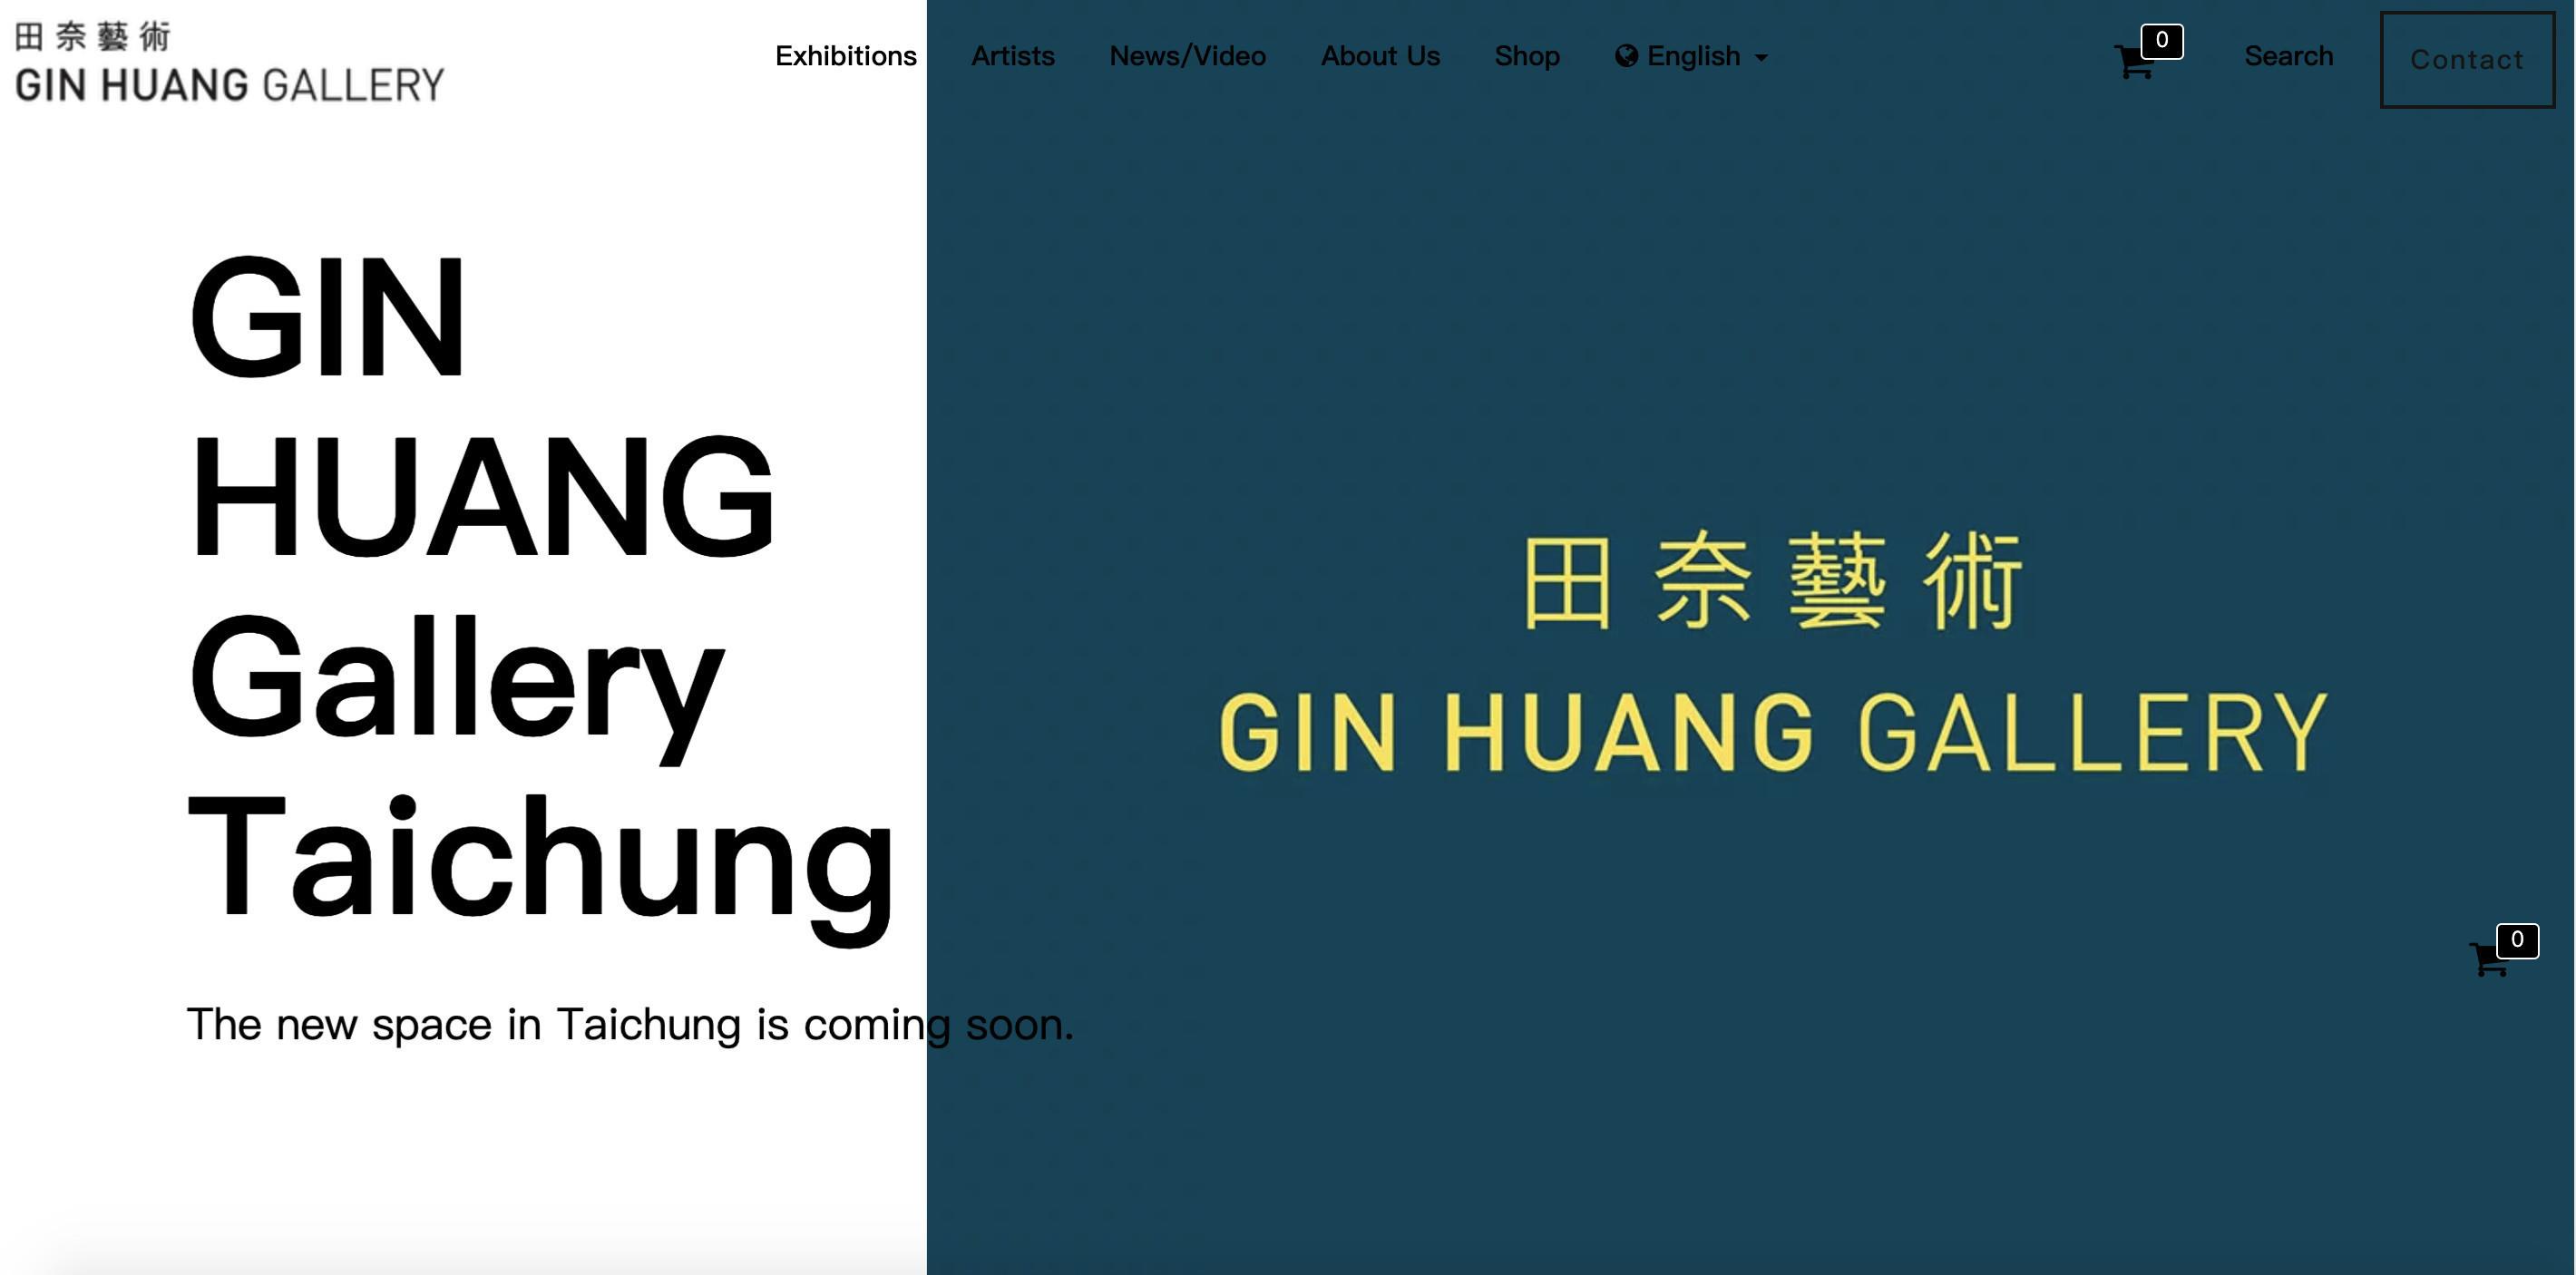 台中SEO網頁設計成功案例-田奈藝術 Gin Huang Gallery